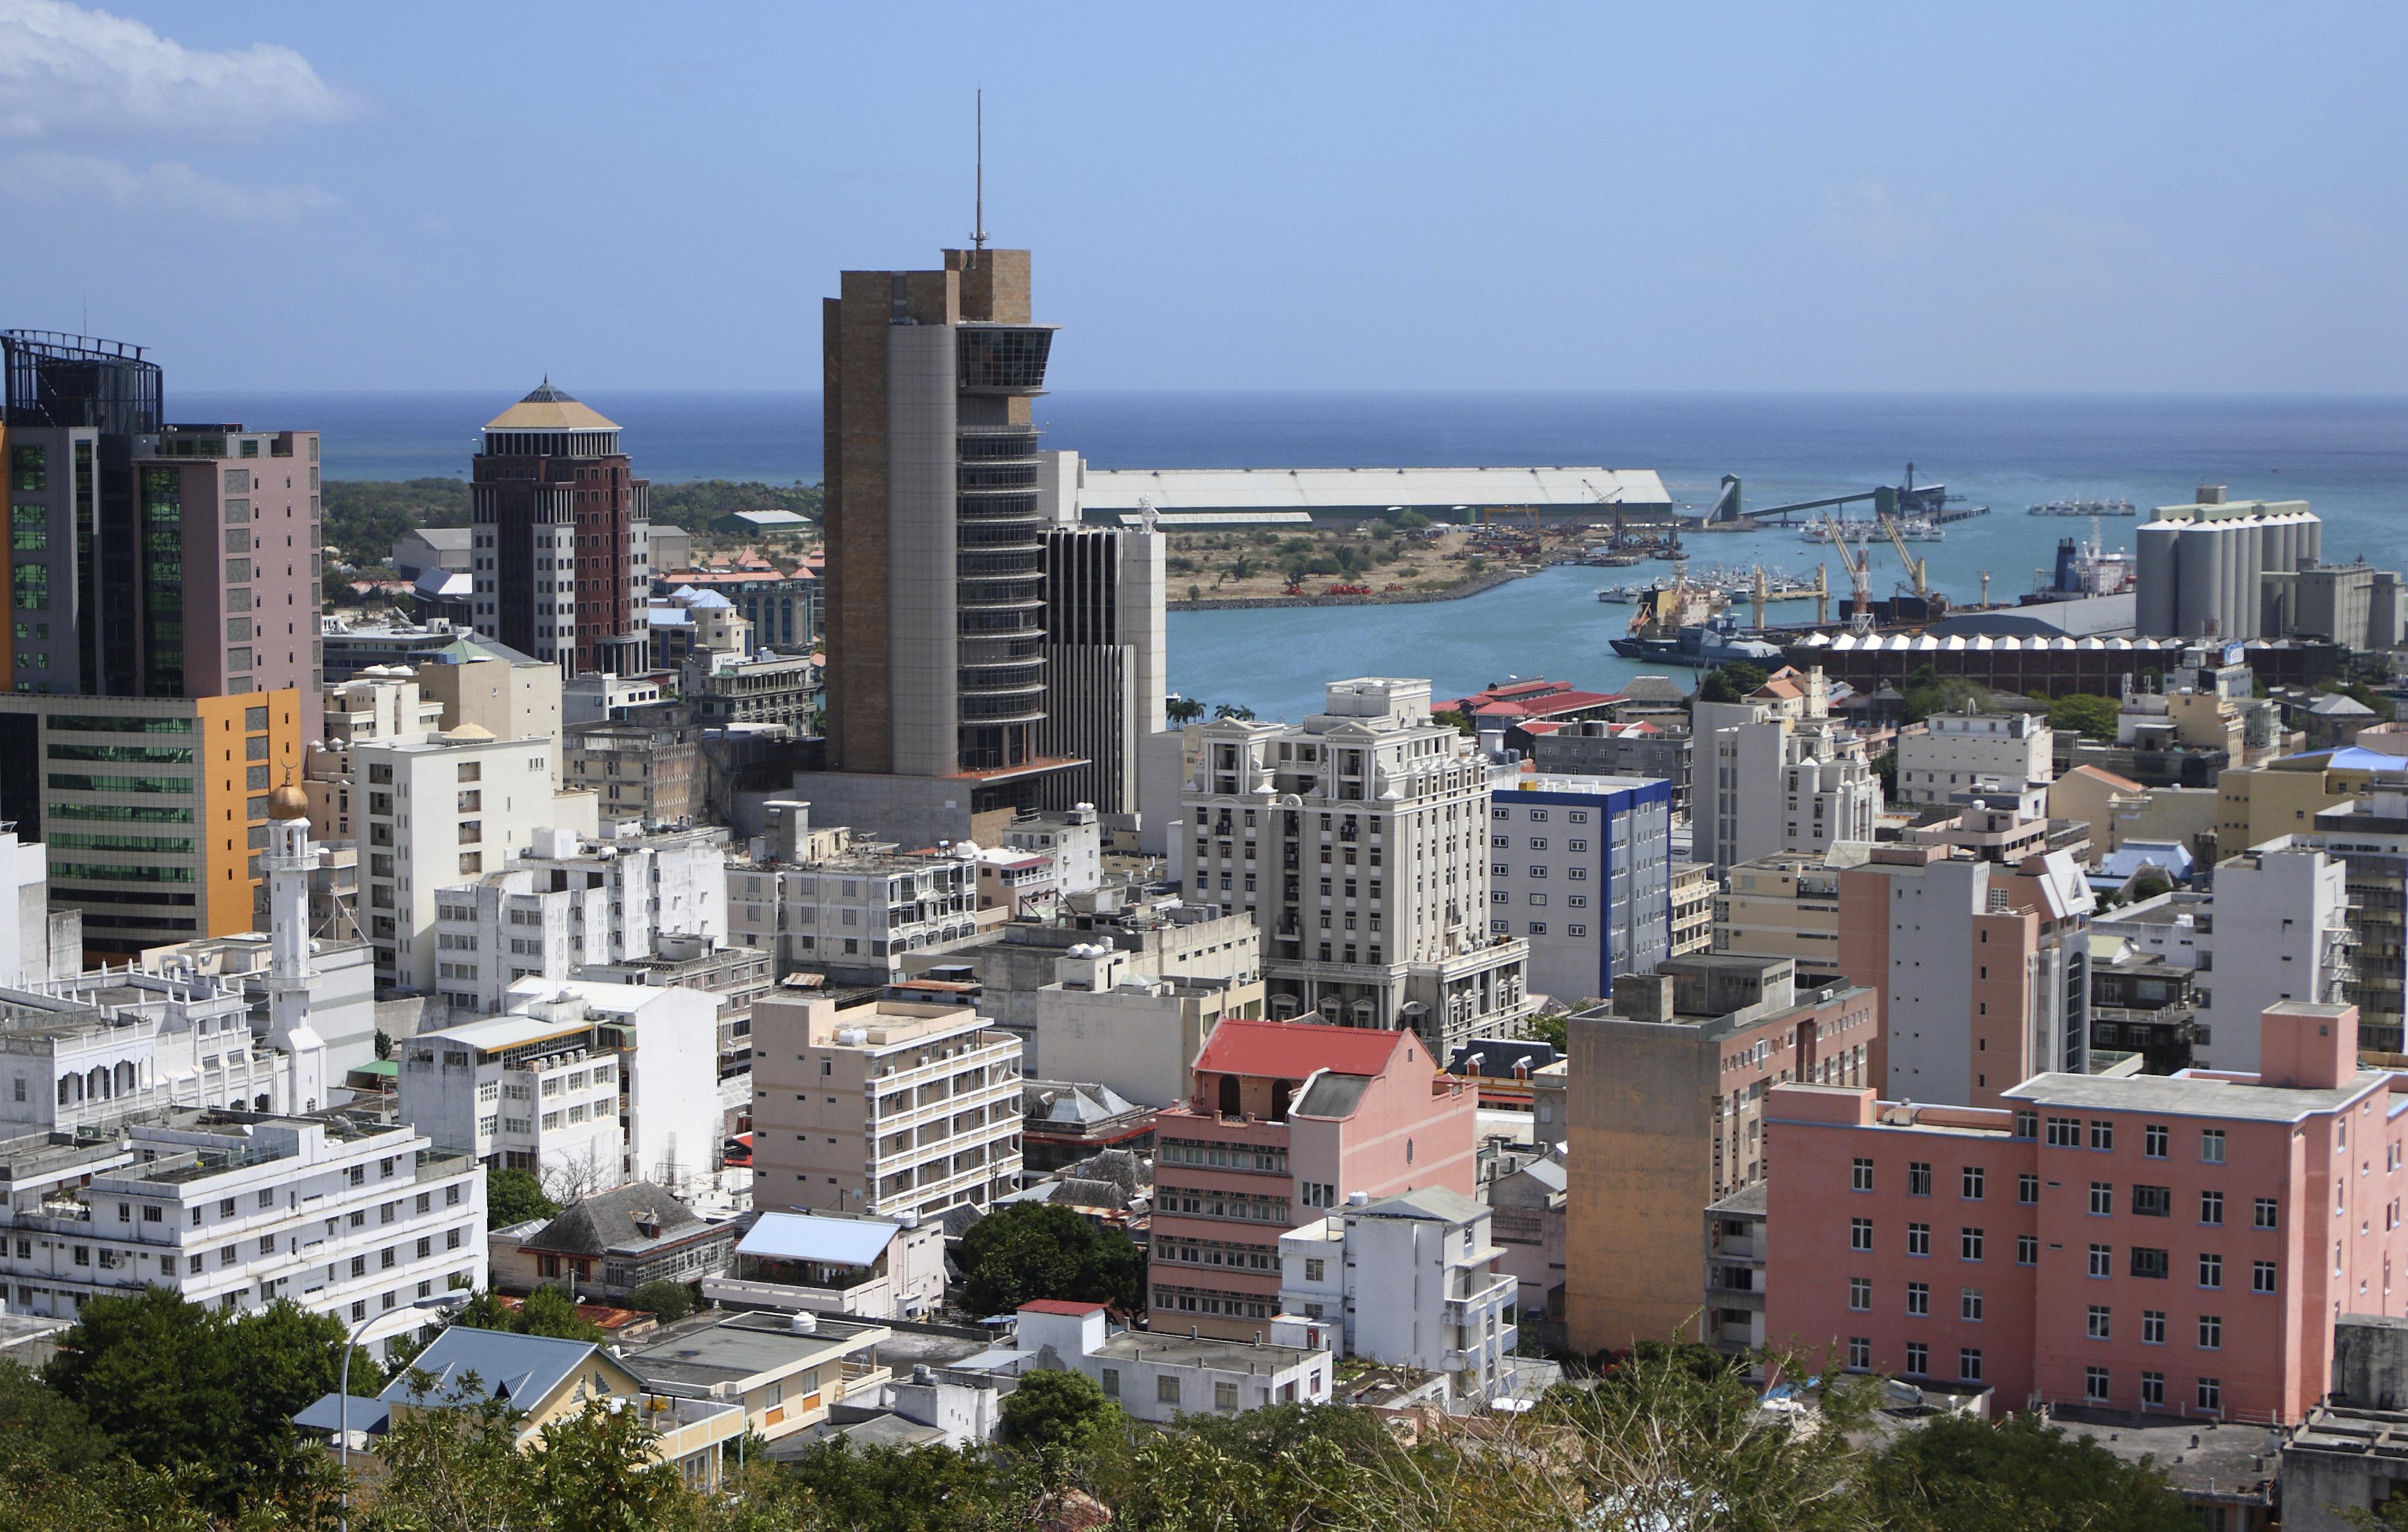 City of Port Louis, Mauritius